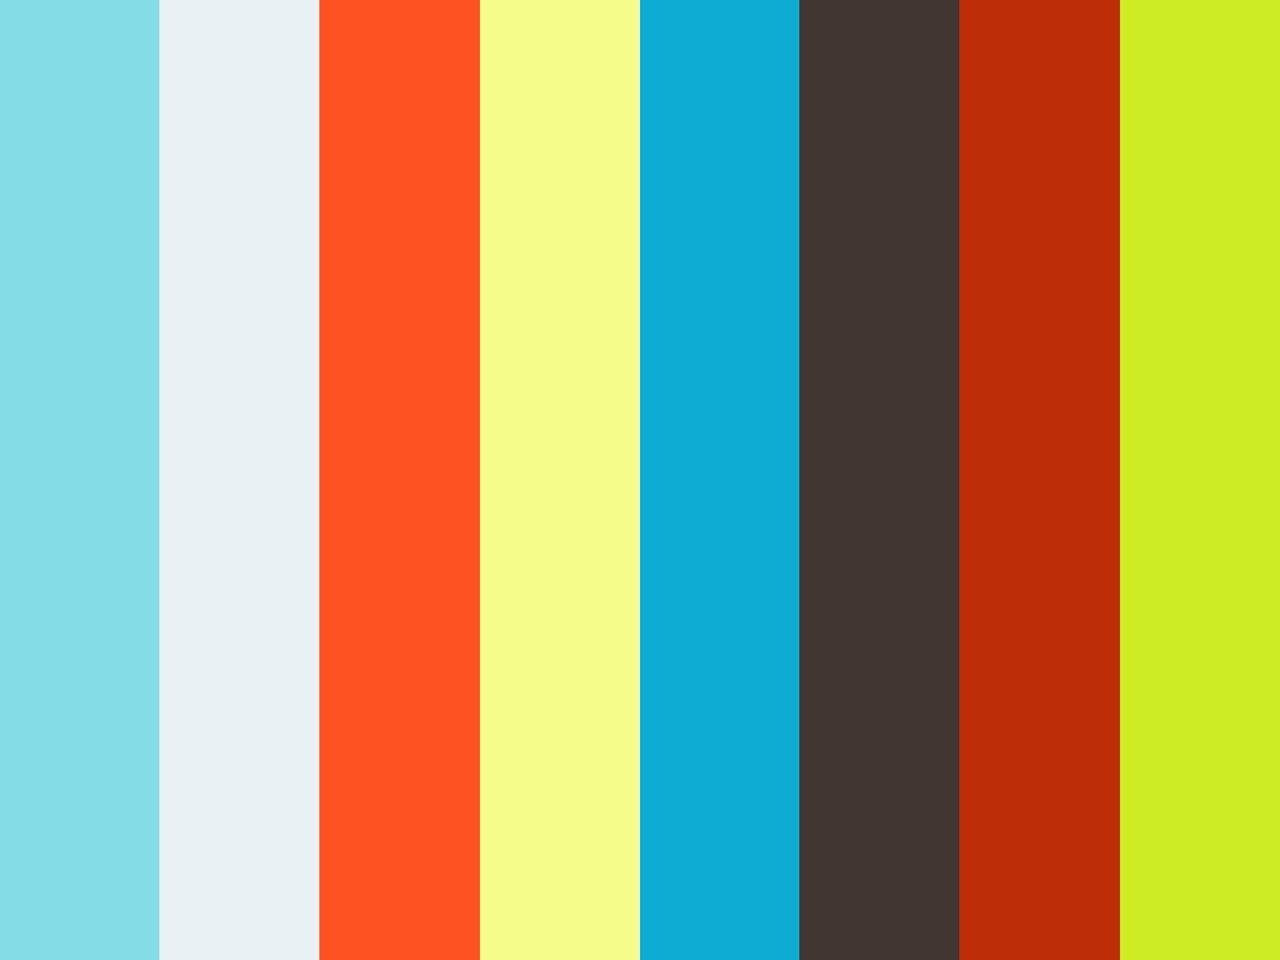 Candace Finn Rocha - Tewaaraton Legend Program Segment